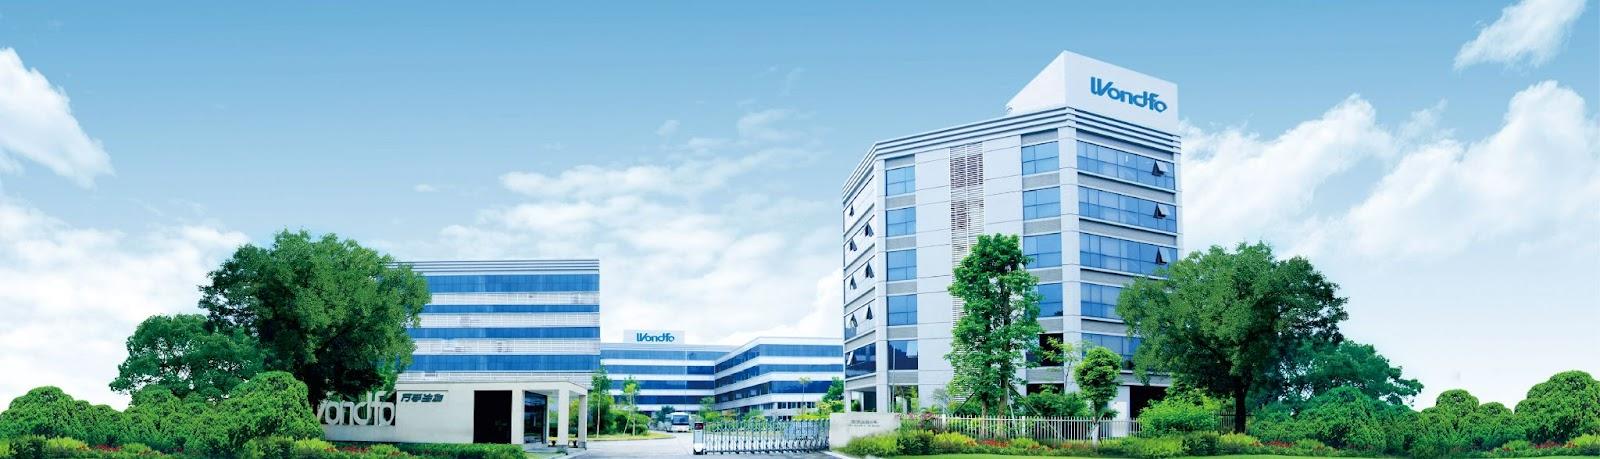 wondfo factory